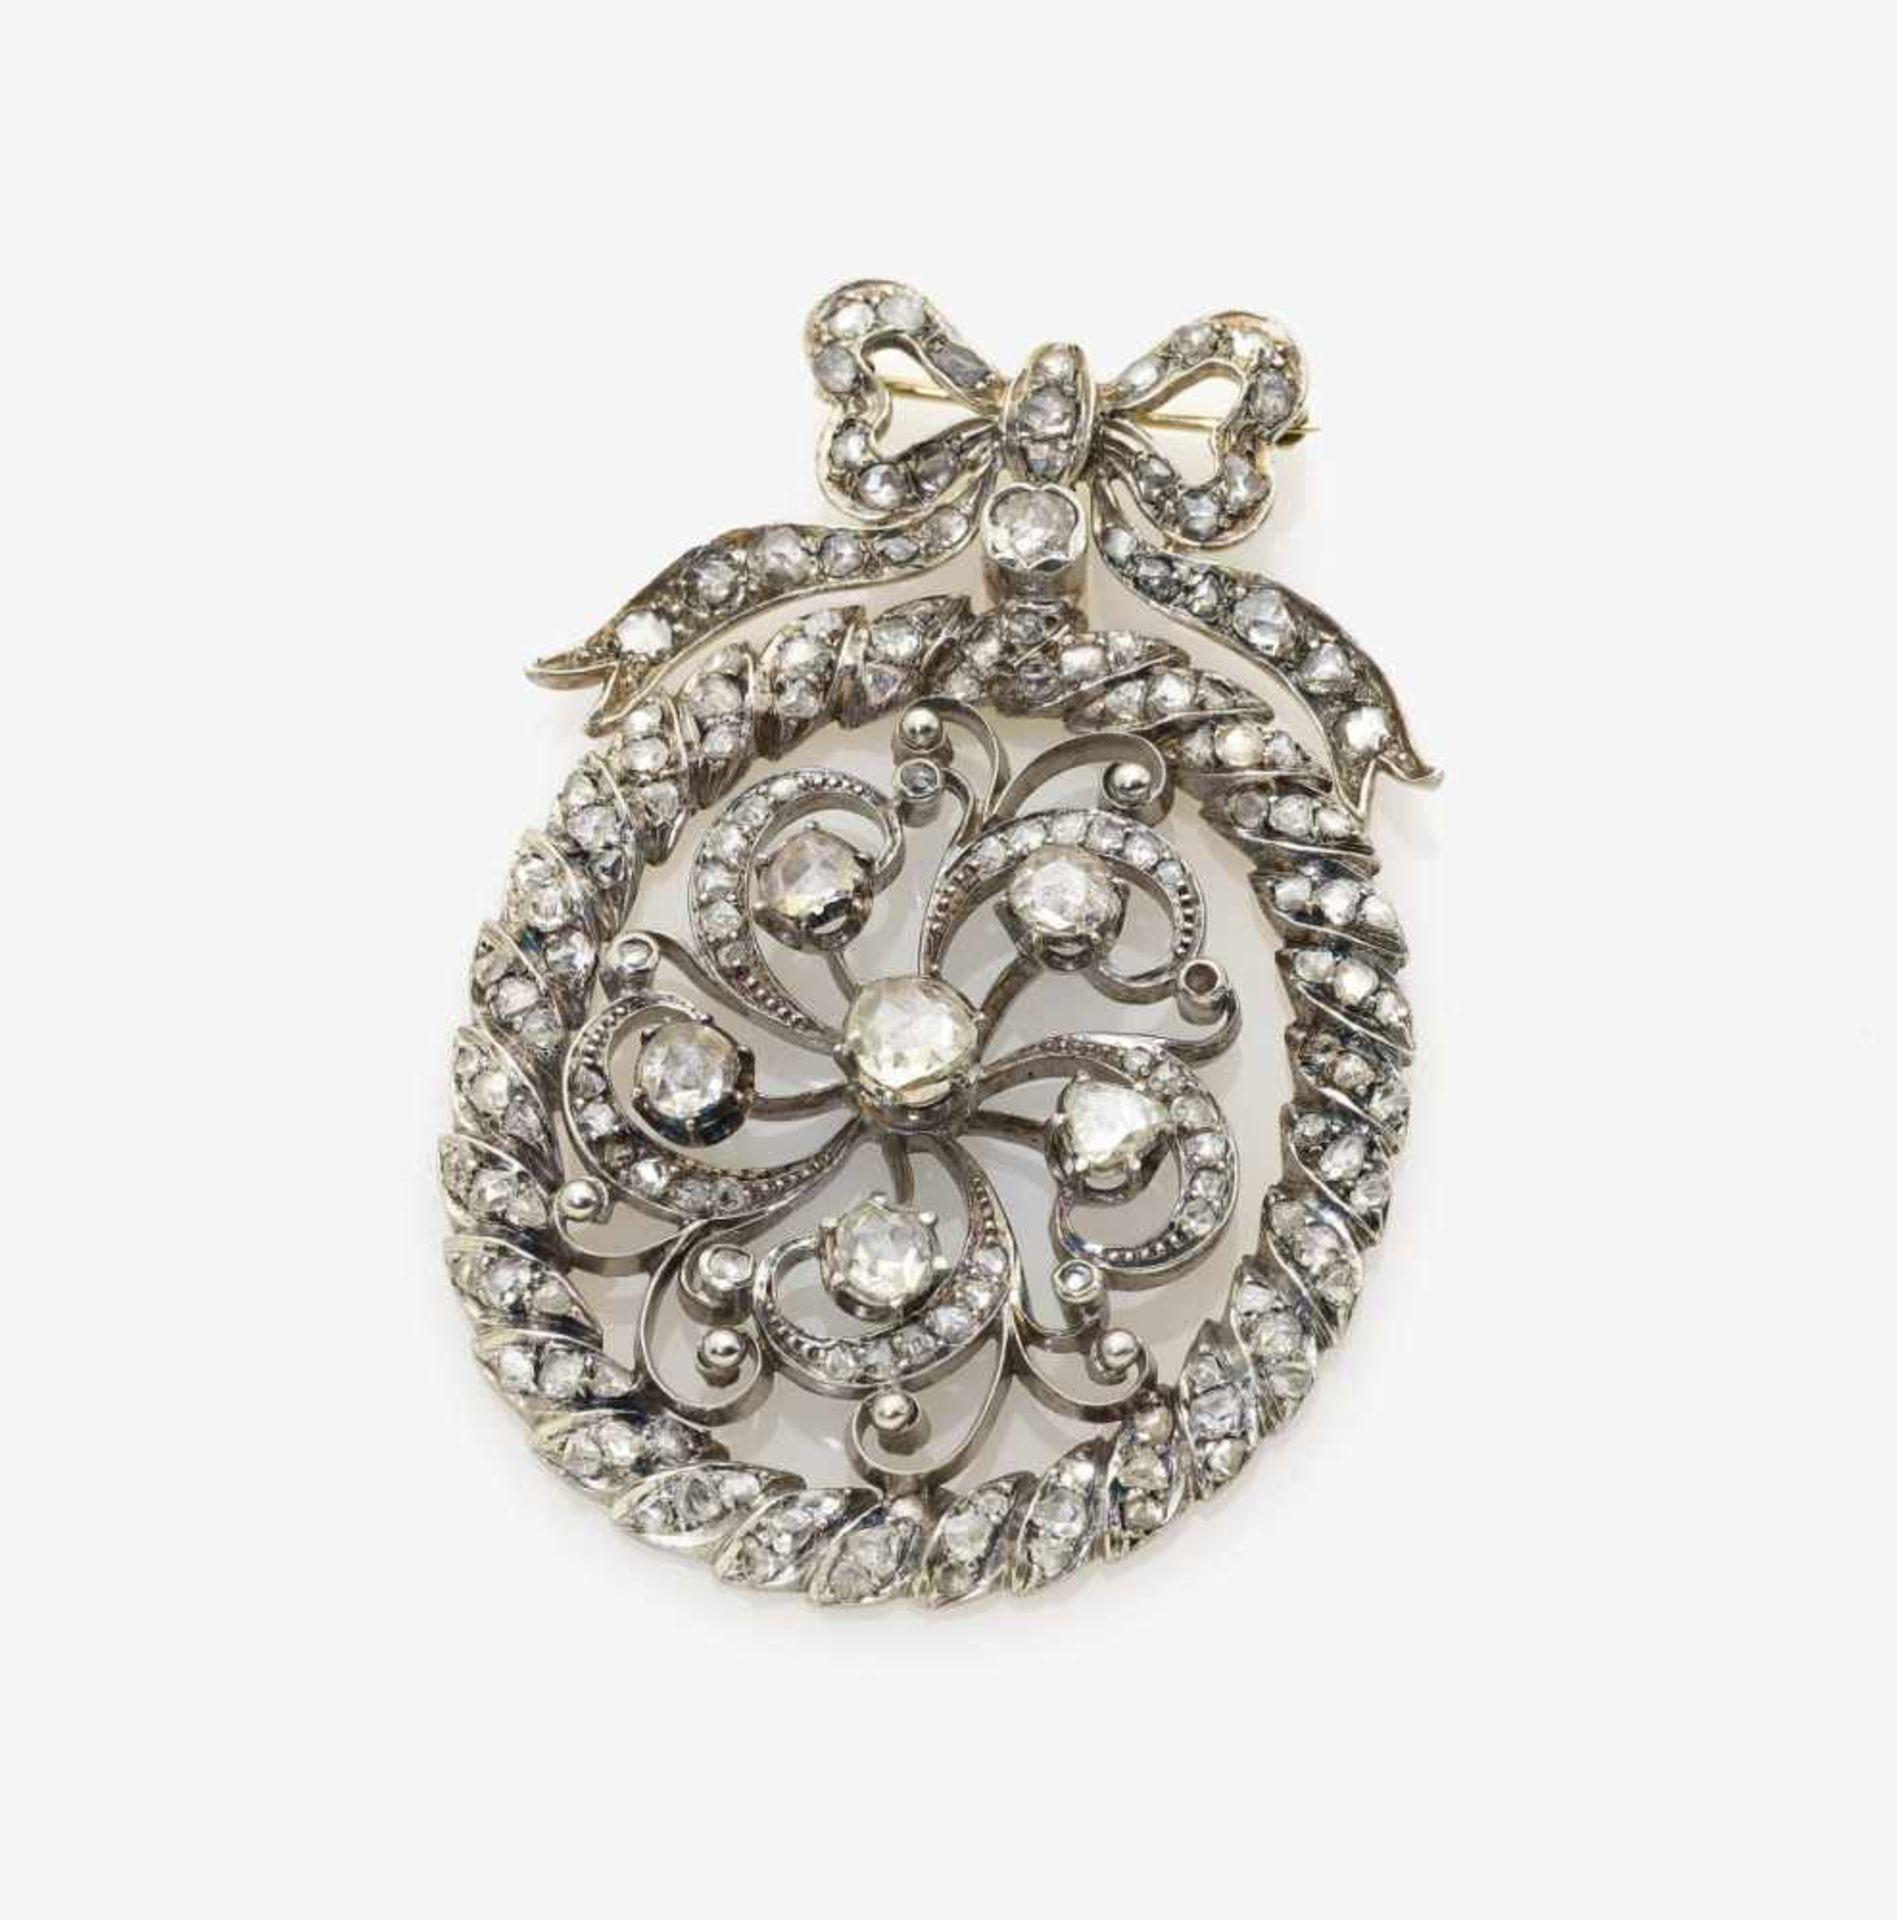 Los 1006 - A Diamond Brooch